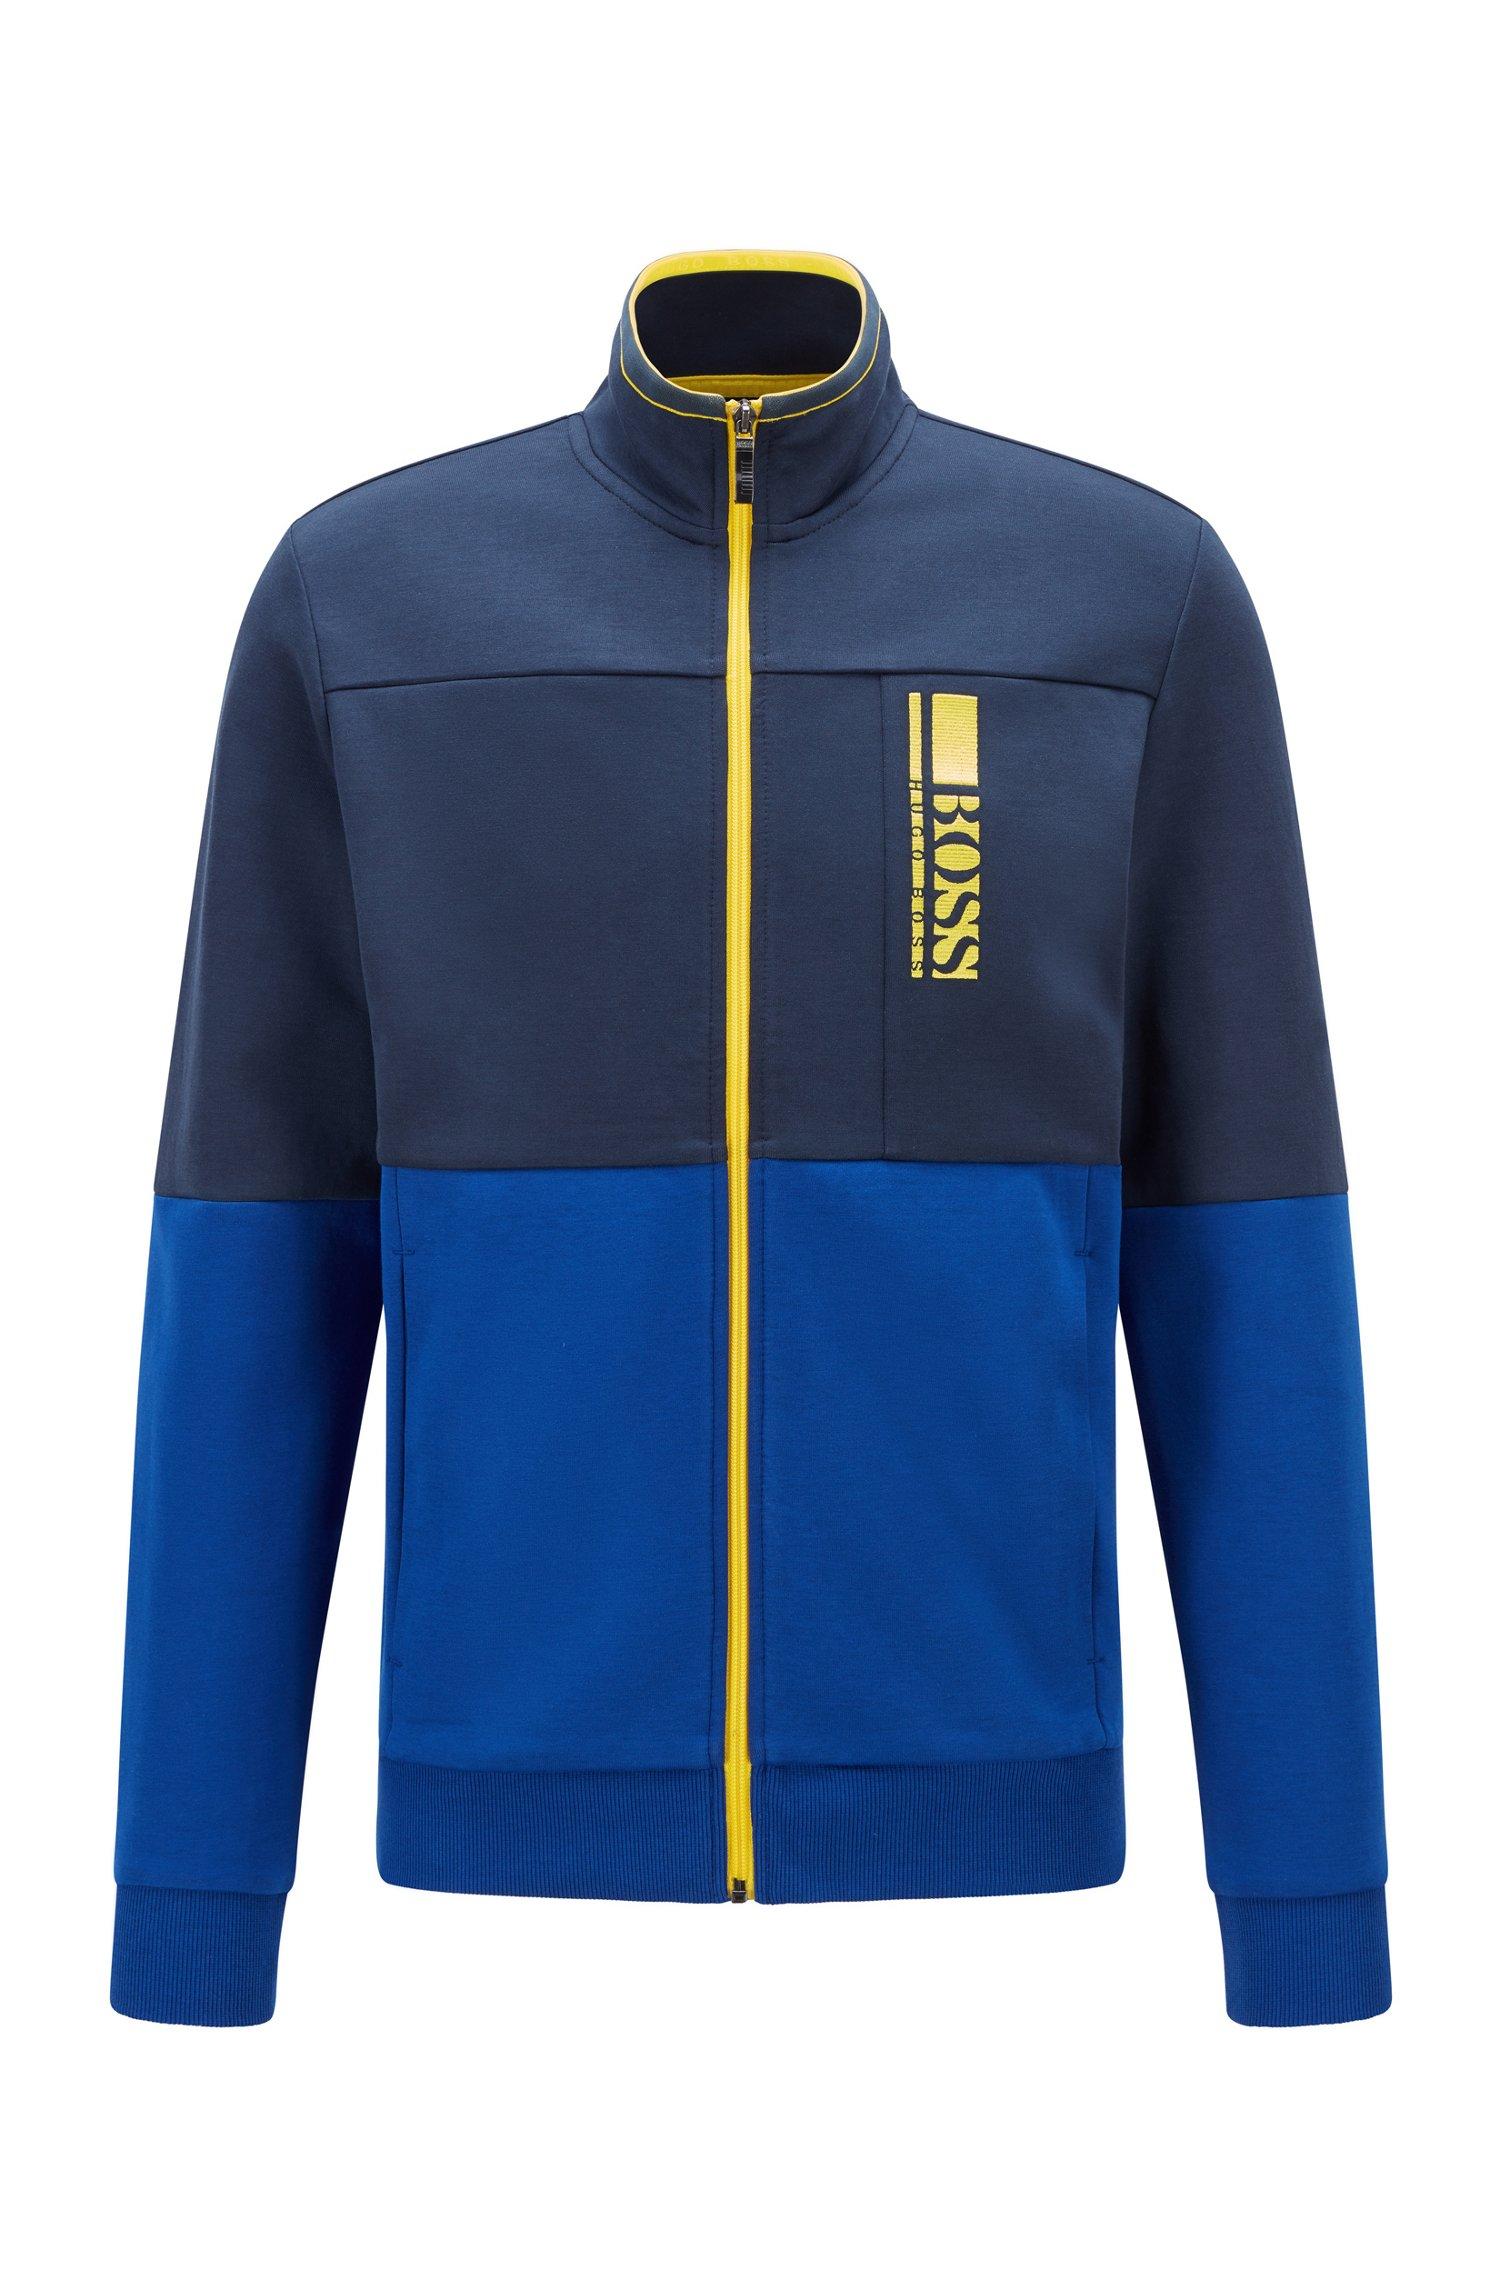 Sweat Regular Fit avec logo color block brodé, Bleu foncé